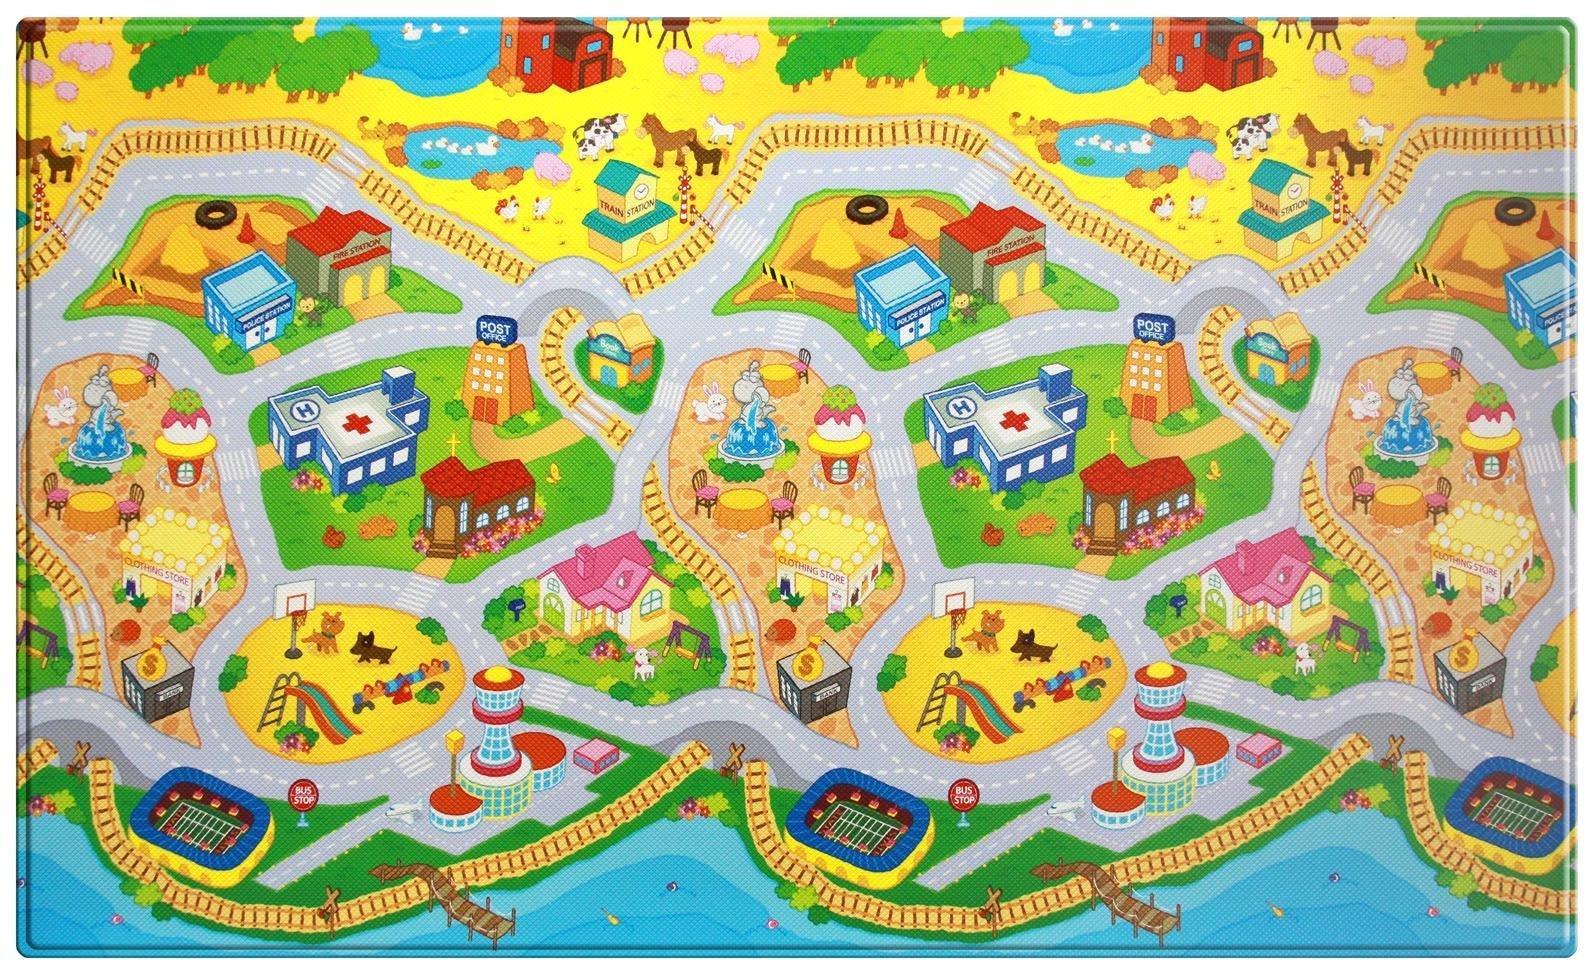 Dwinguler My Town Large Kid's Playmat by Dwinguler (Image #1)